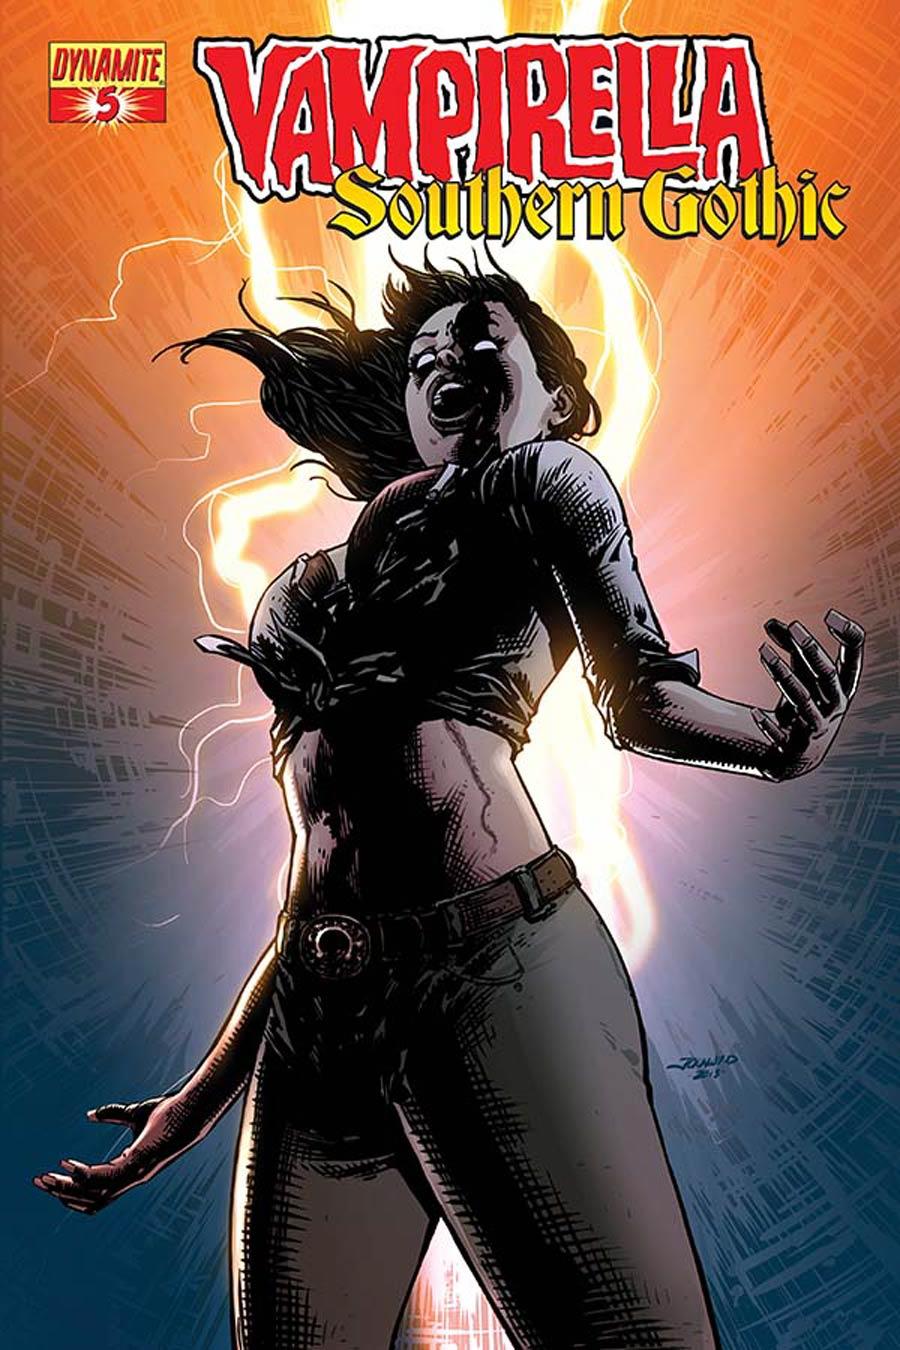 Vampirella Southern Gothic #5 Cover A Regular Johnny Desjardins Cover